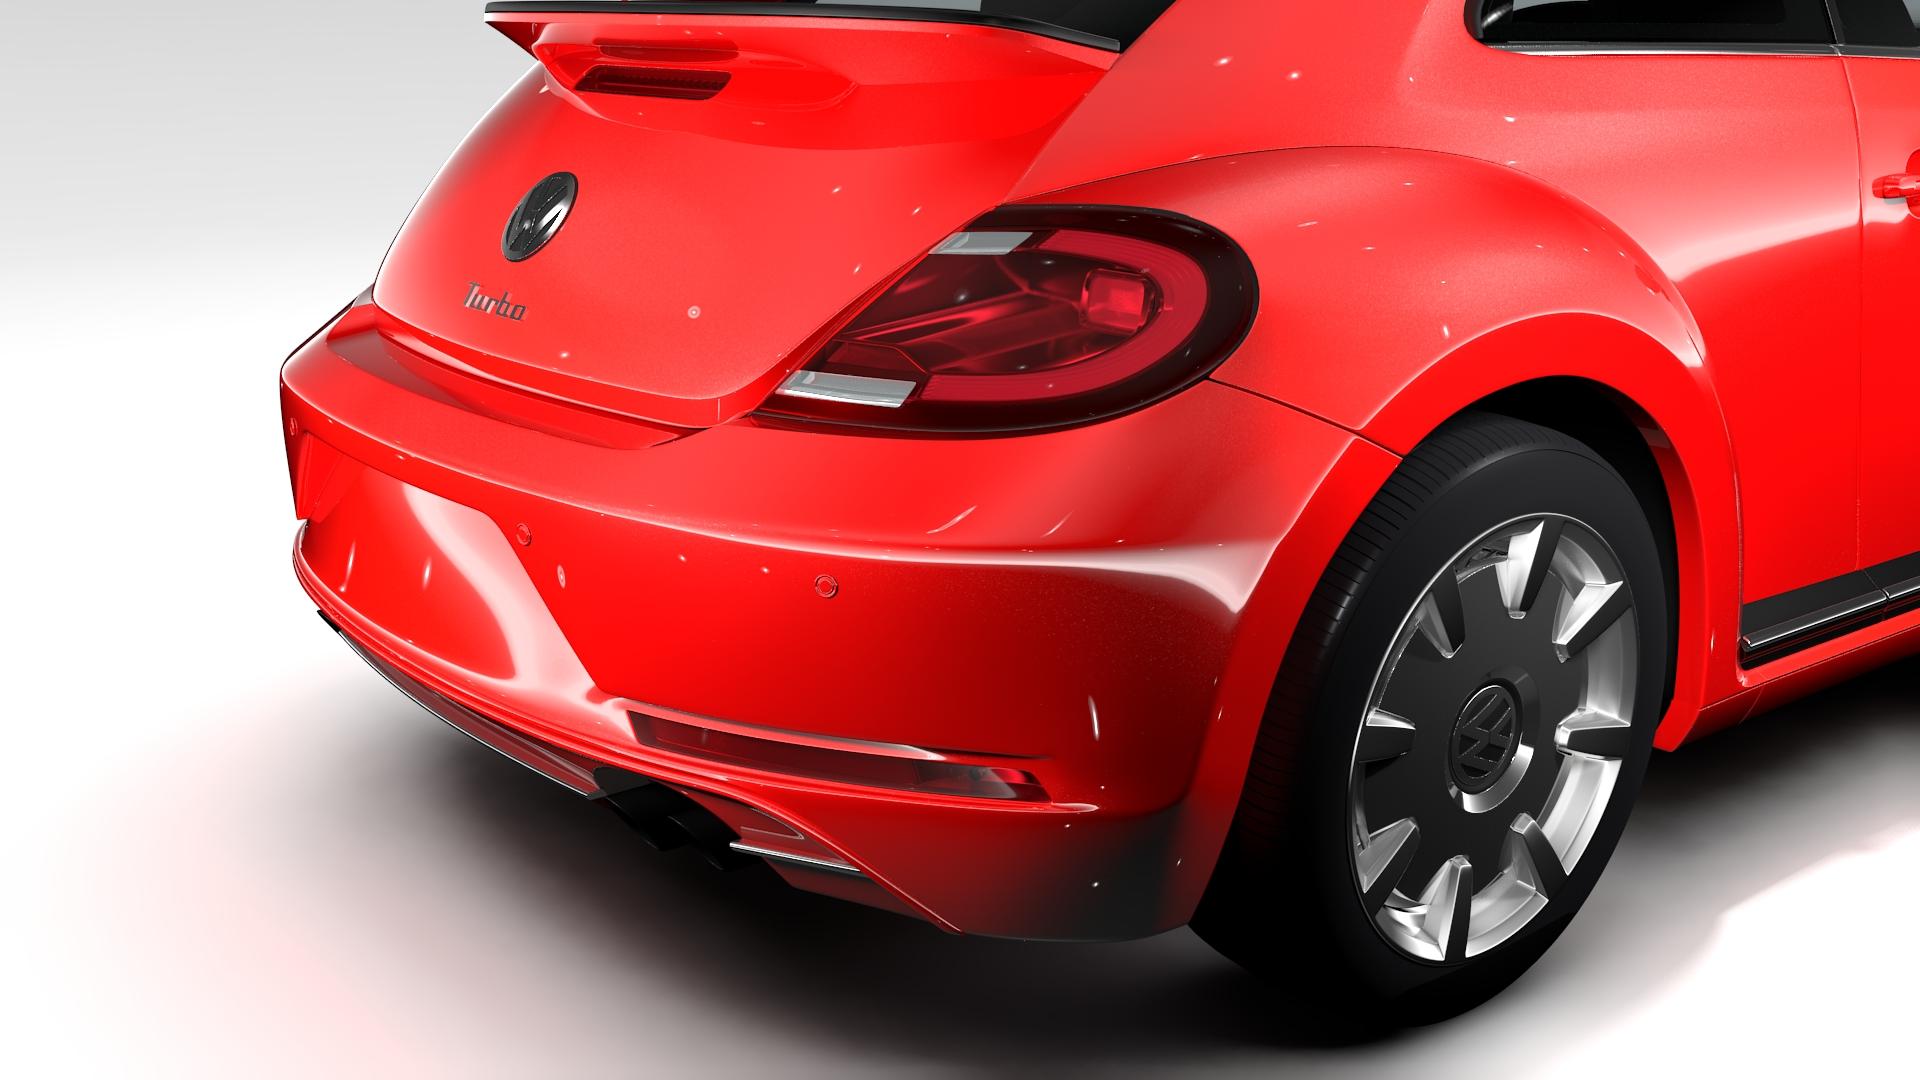 vw beetle turbo 2017 3d model 3ds max fbx c4d lwo ma mb hrc xsi obj 221661